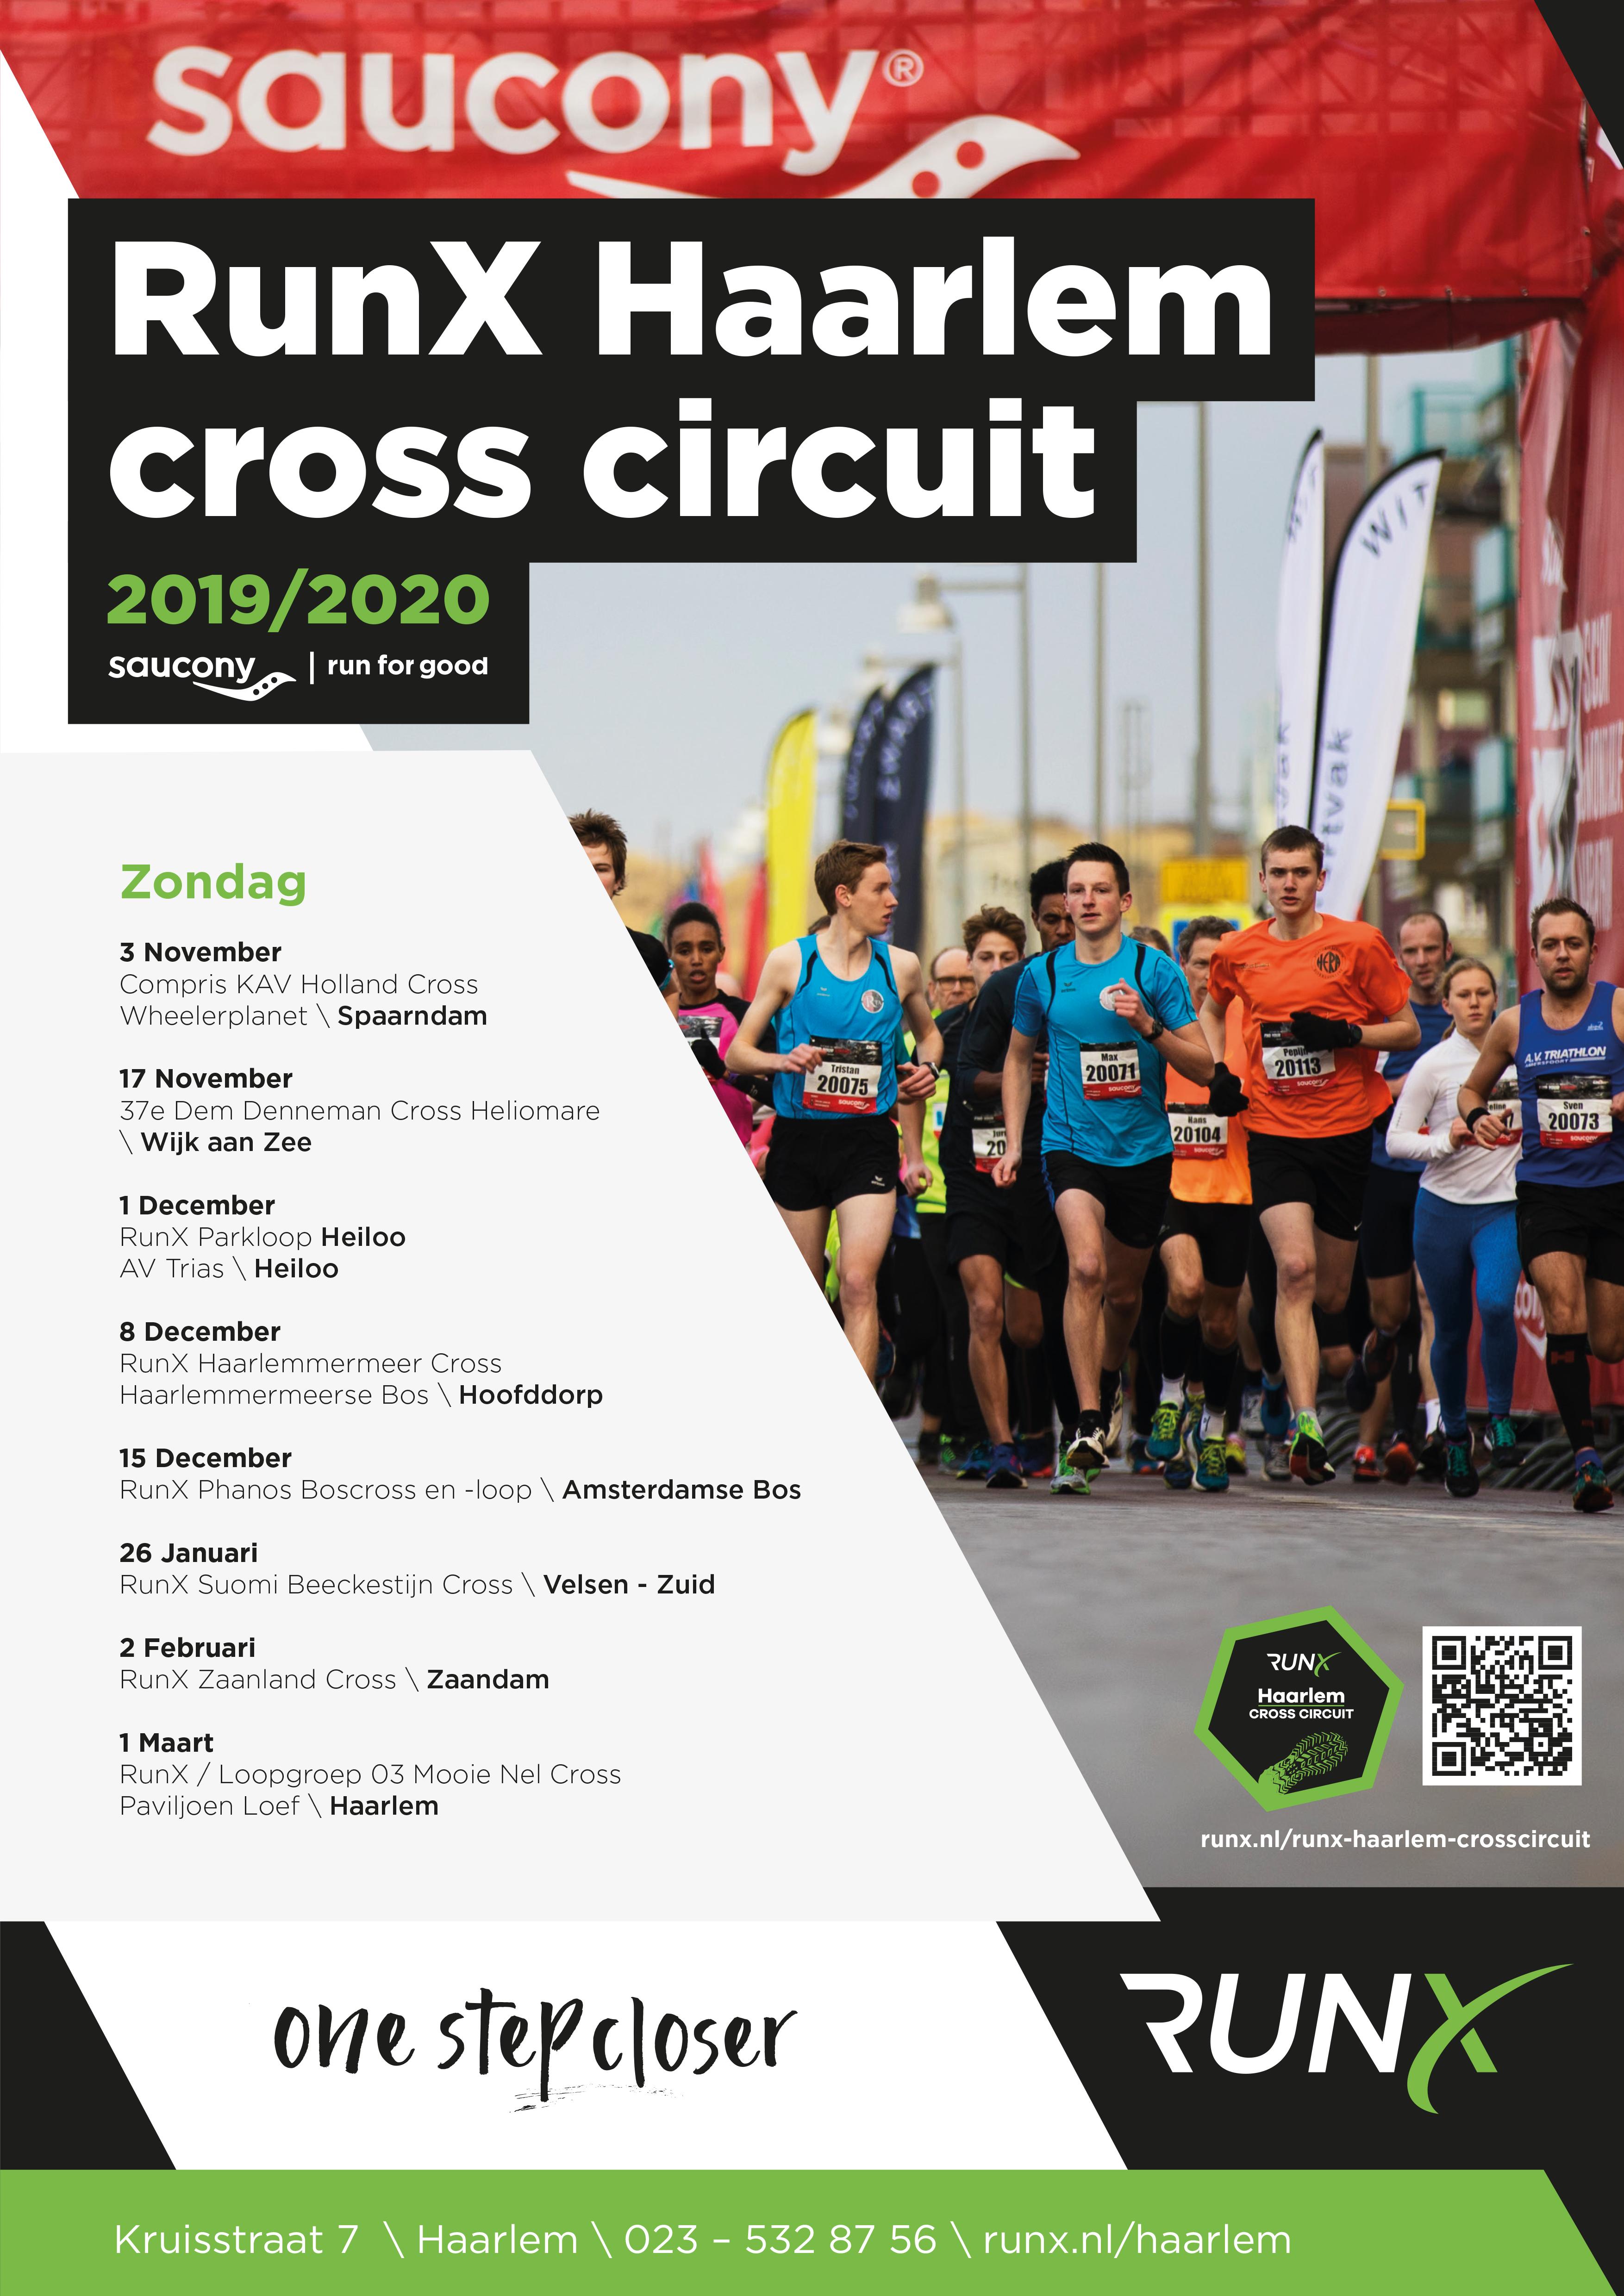 RunX Haarlem Cross Circuit 2019/20